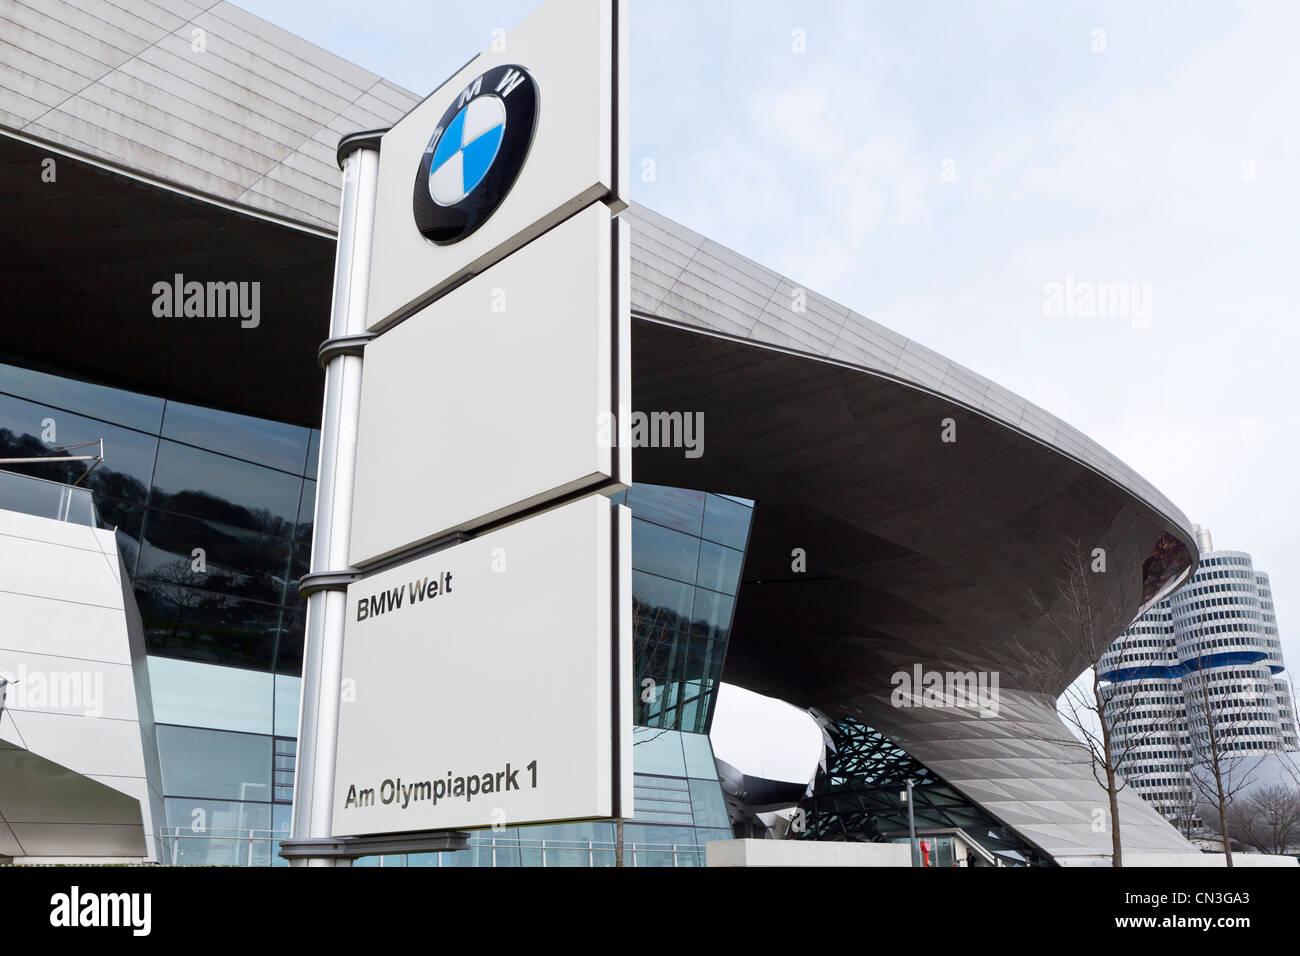 BMW Welt (BMW world) - Munich, Bavaria, Germany, Europe - Stock Image